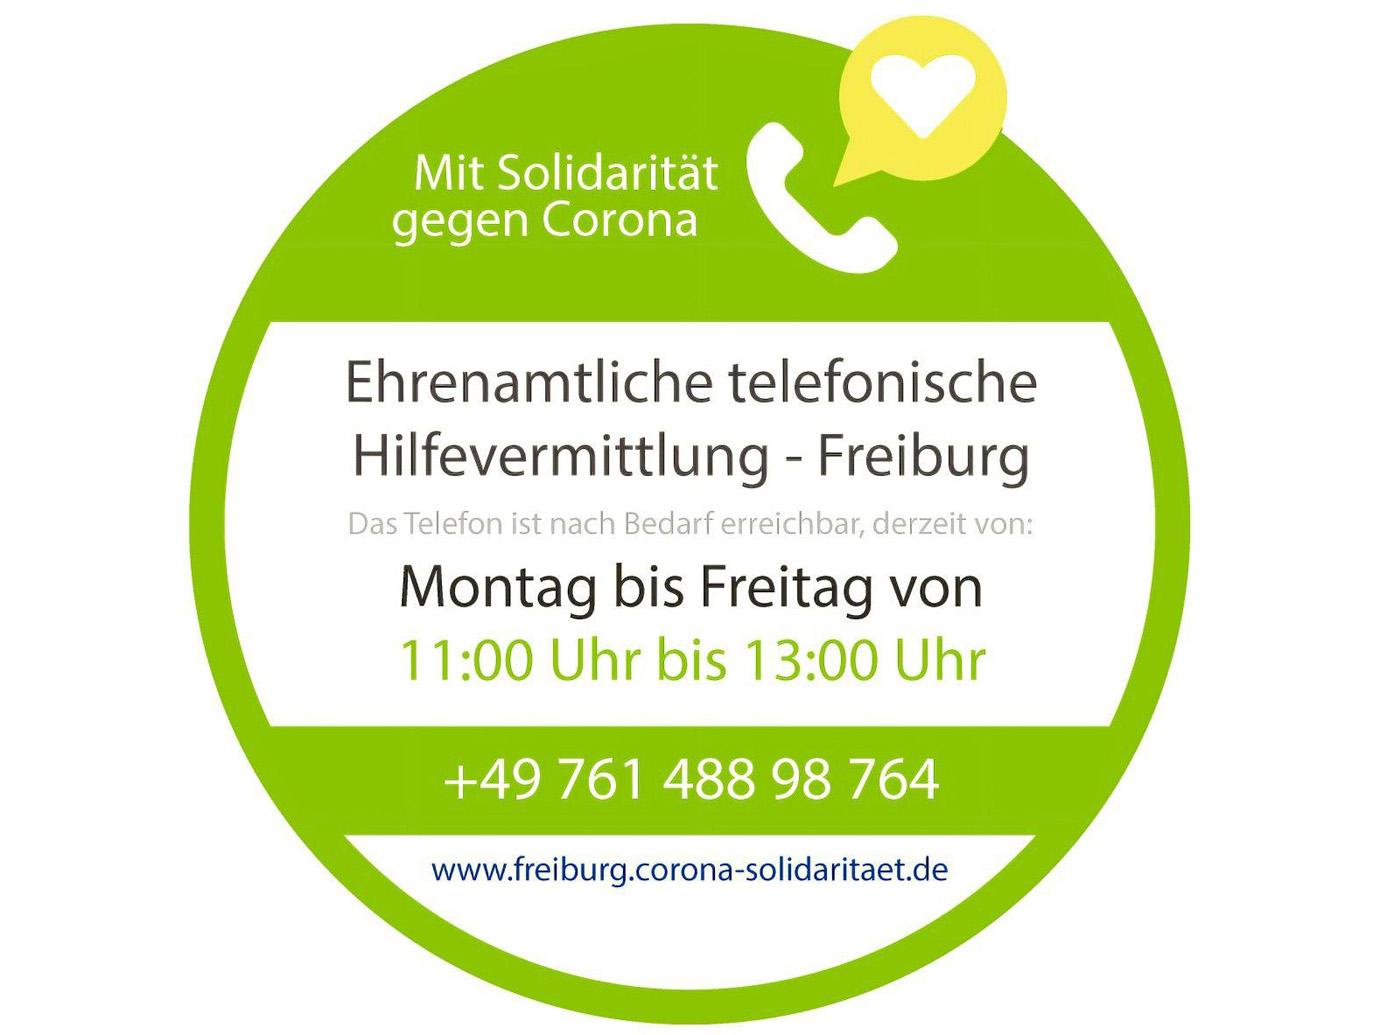 Freiburger Solidarität gegen Corona